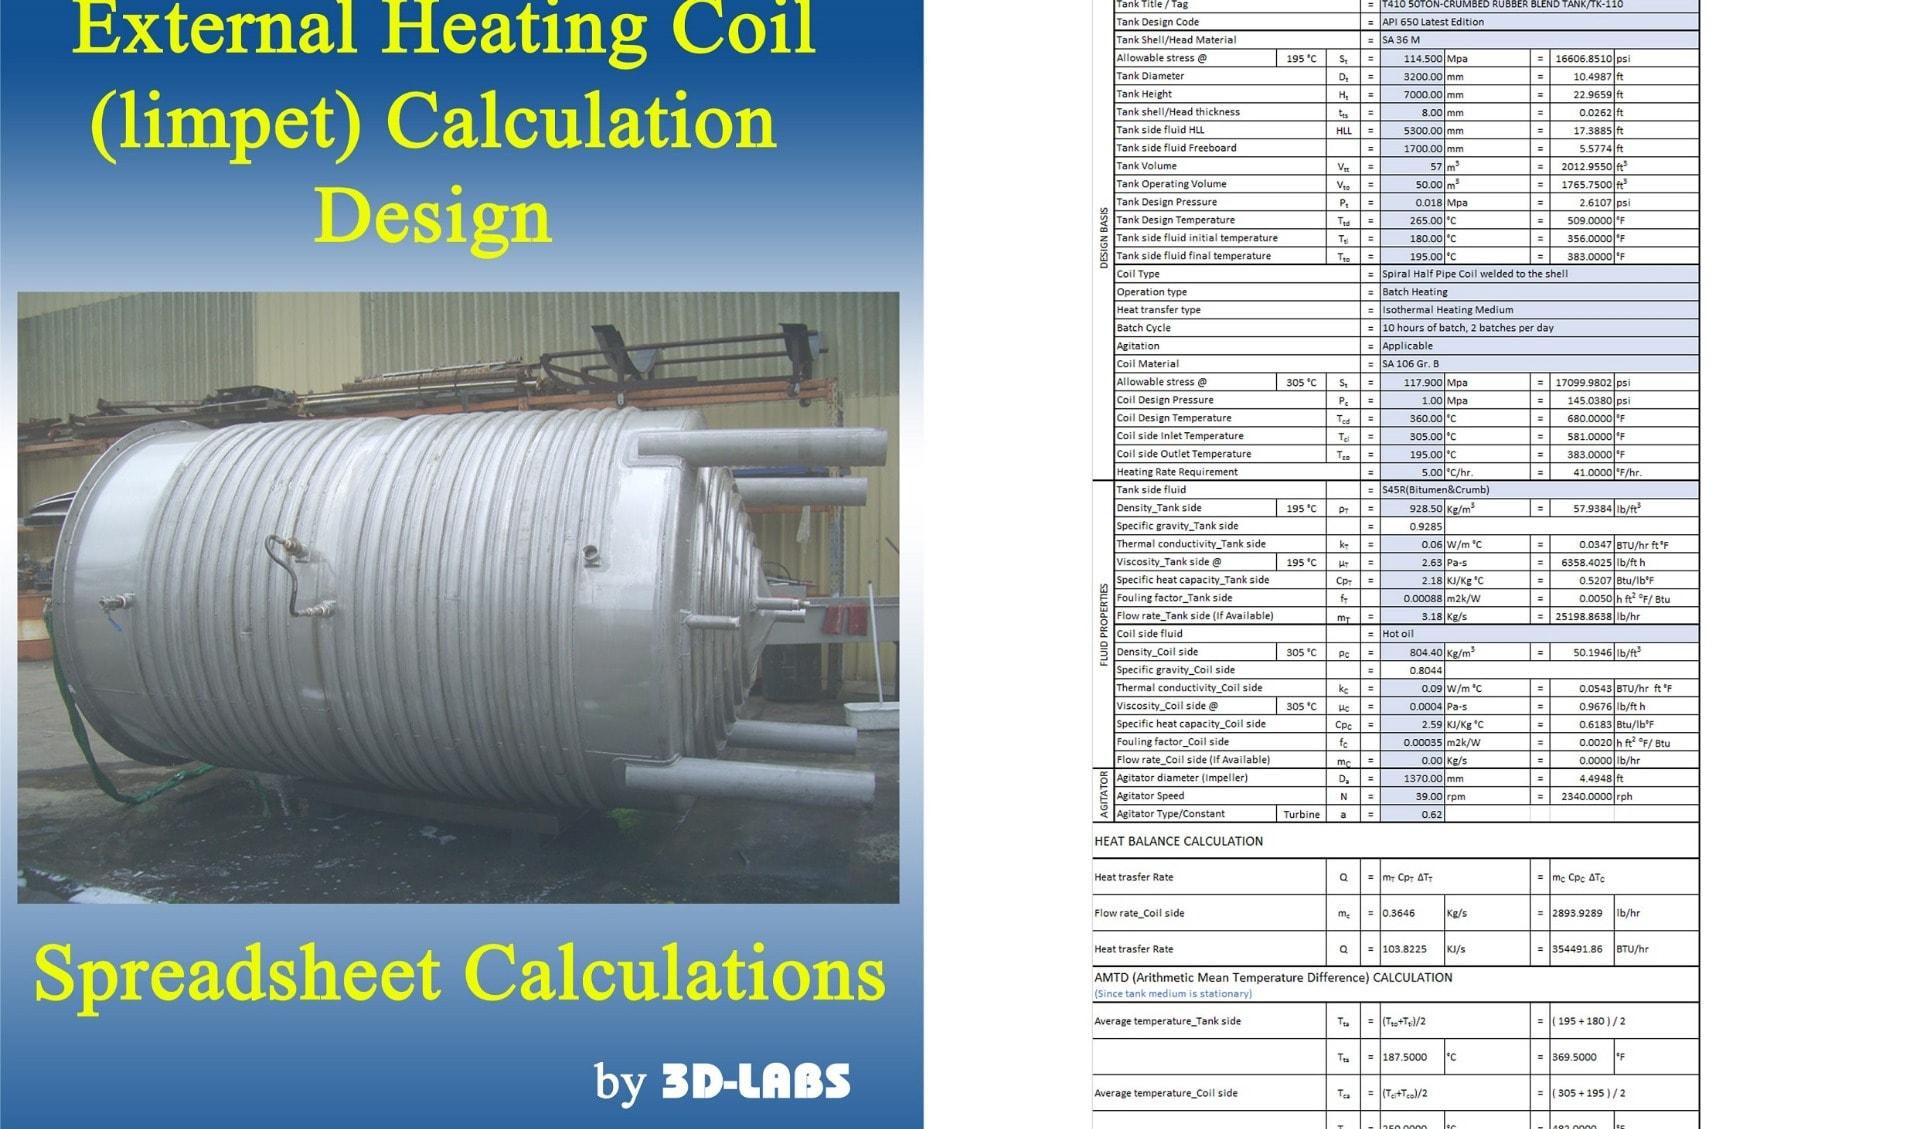 Crumbed Rubber Blend Tank, external heating coil design